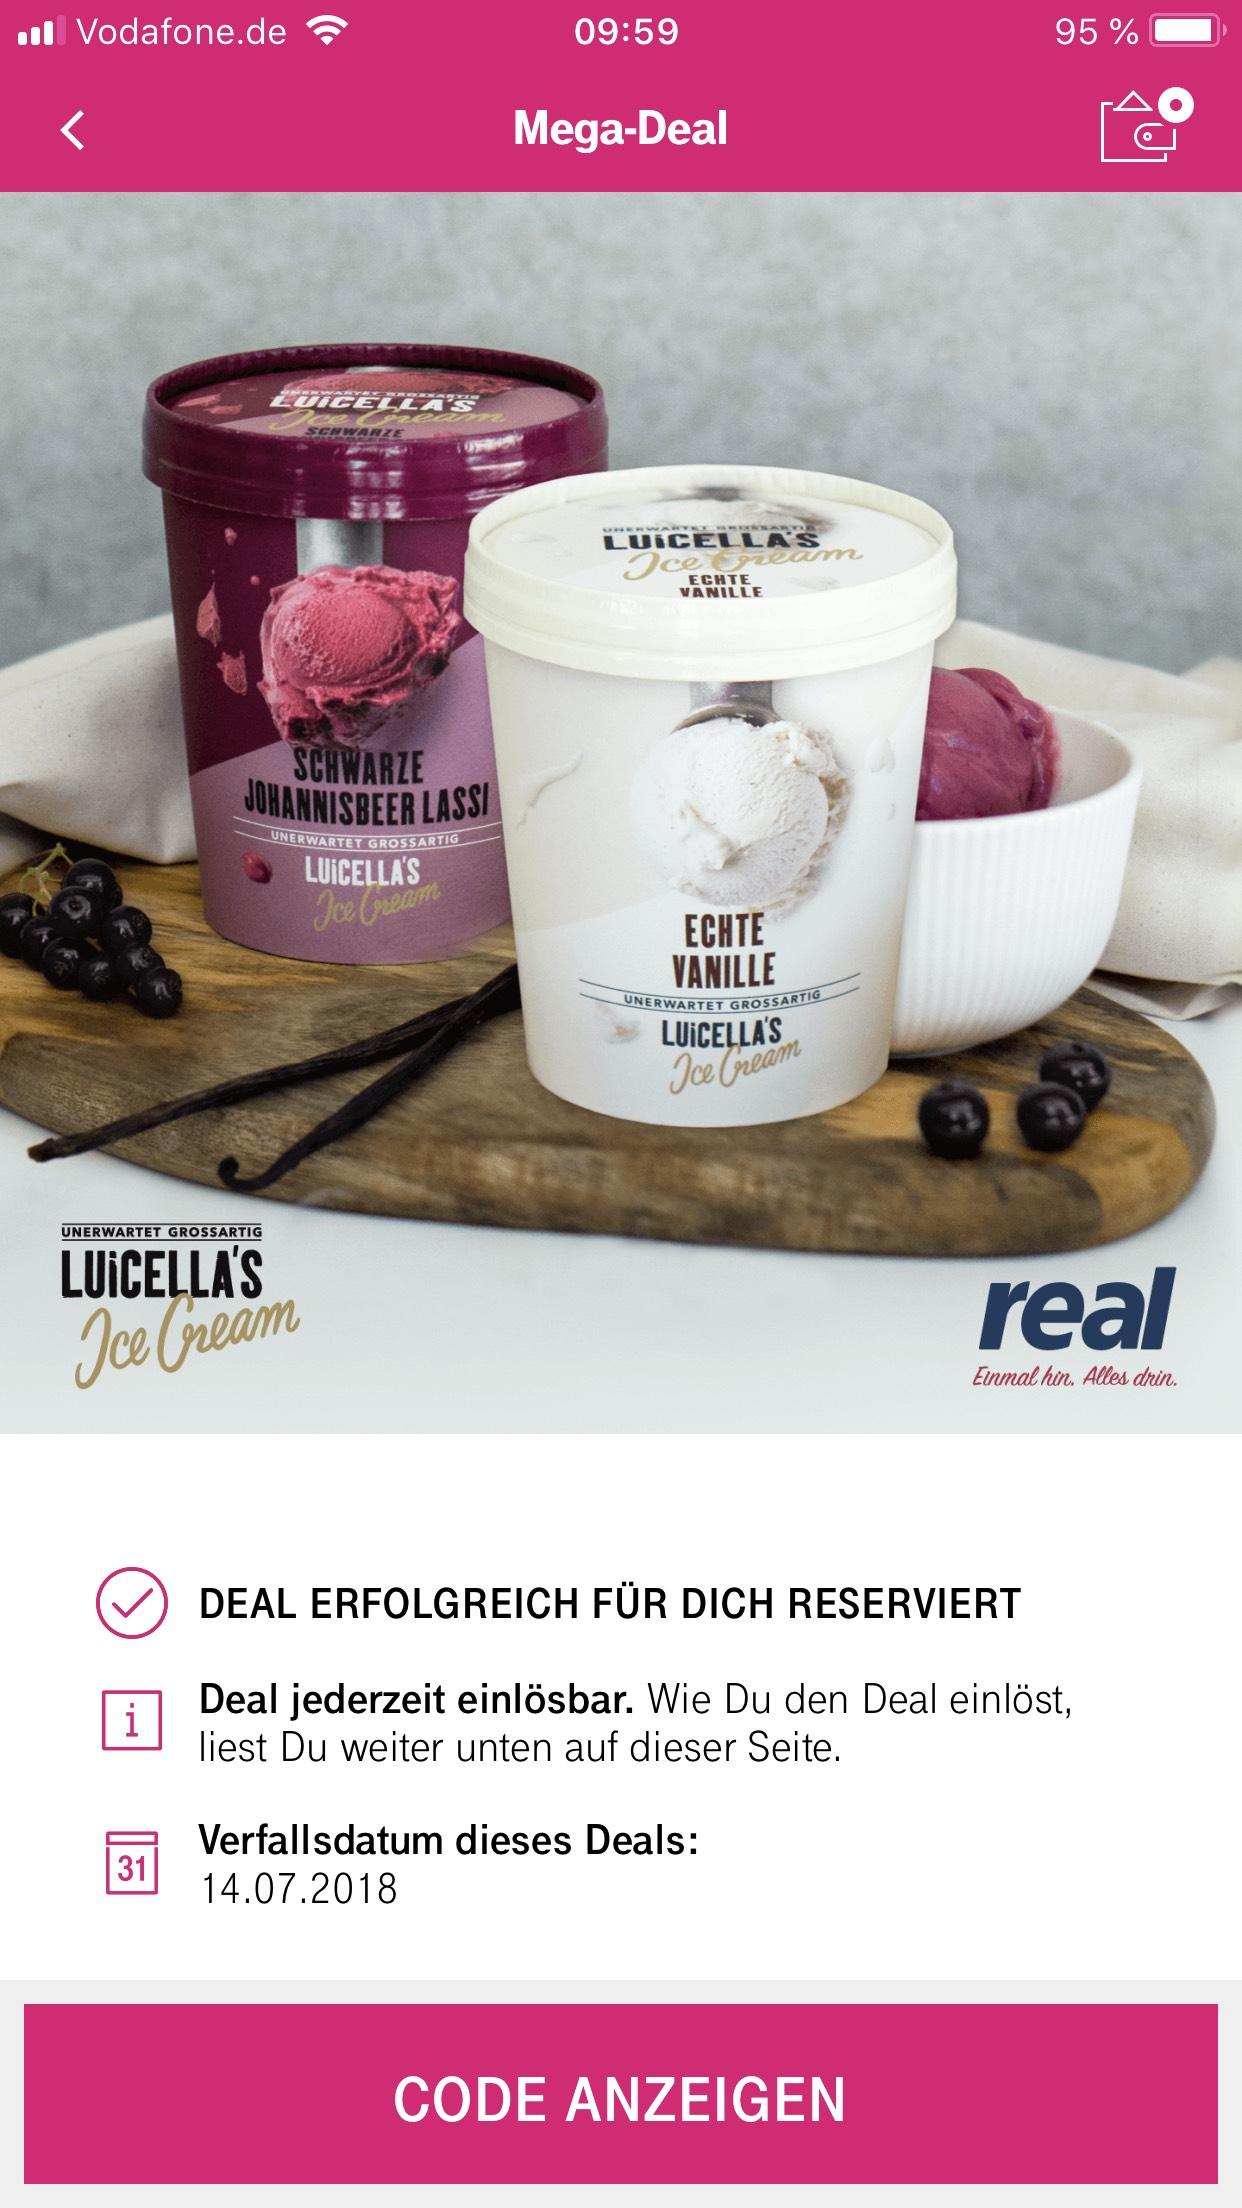 Telekom Mega-Deal Luicella's Eis kostenlos